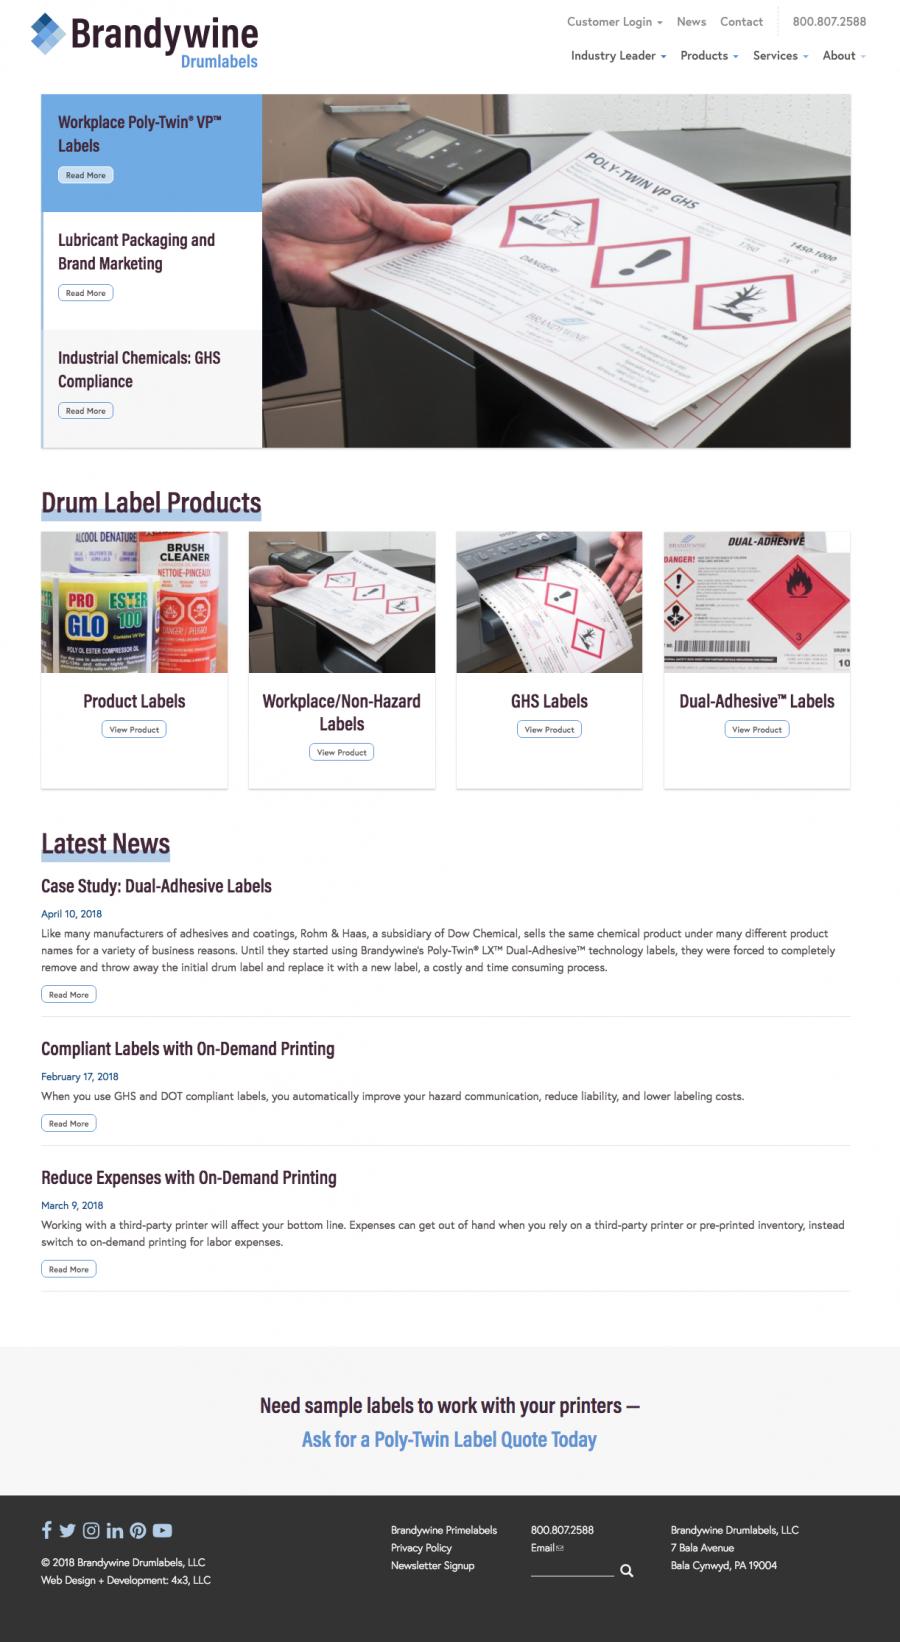 Brandywine Drumlabels Homepage Design